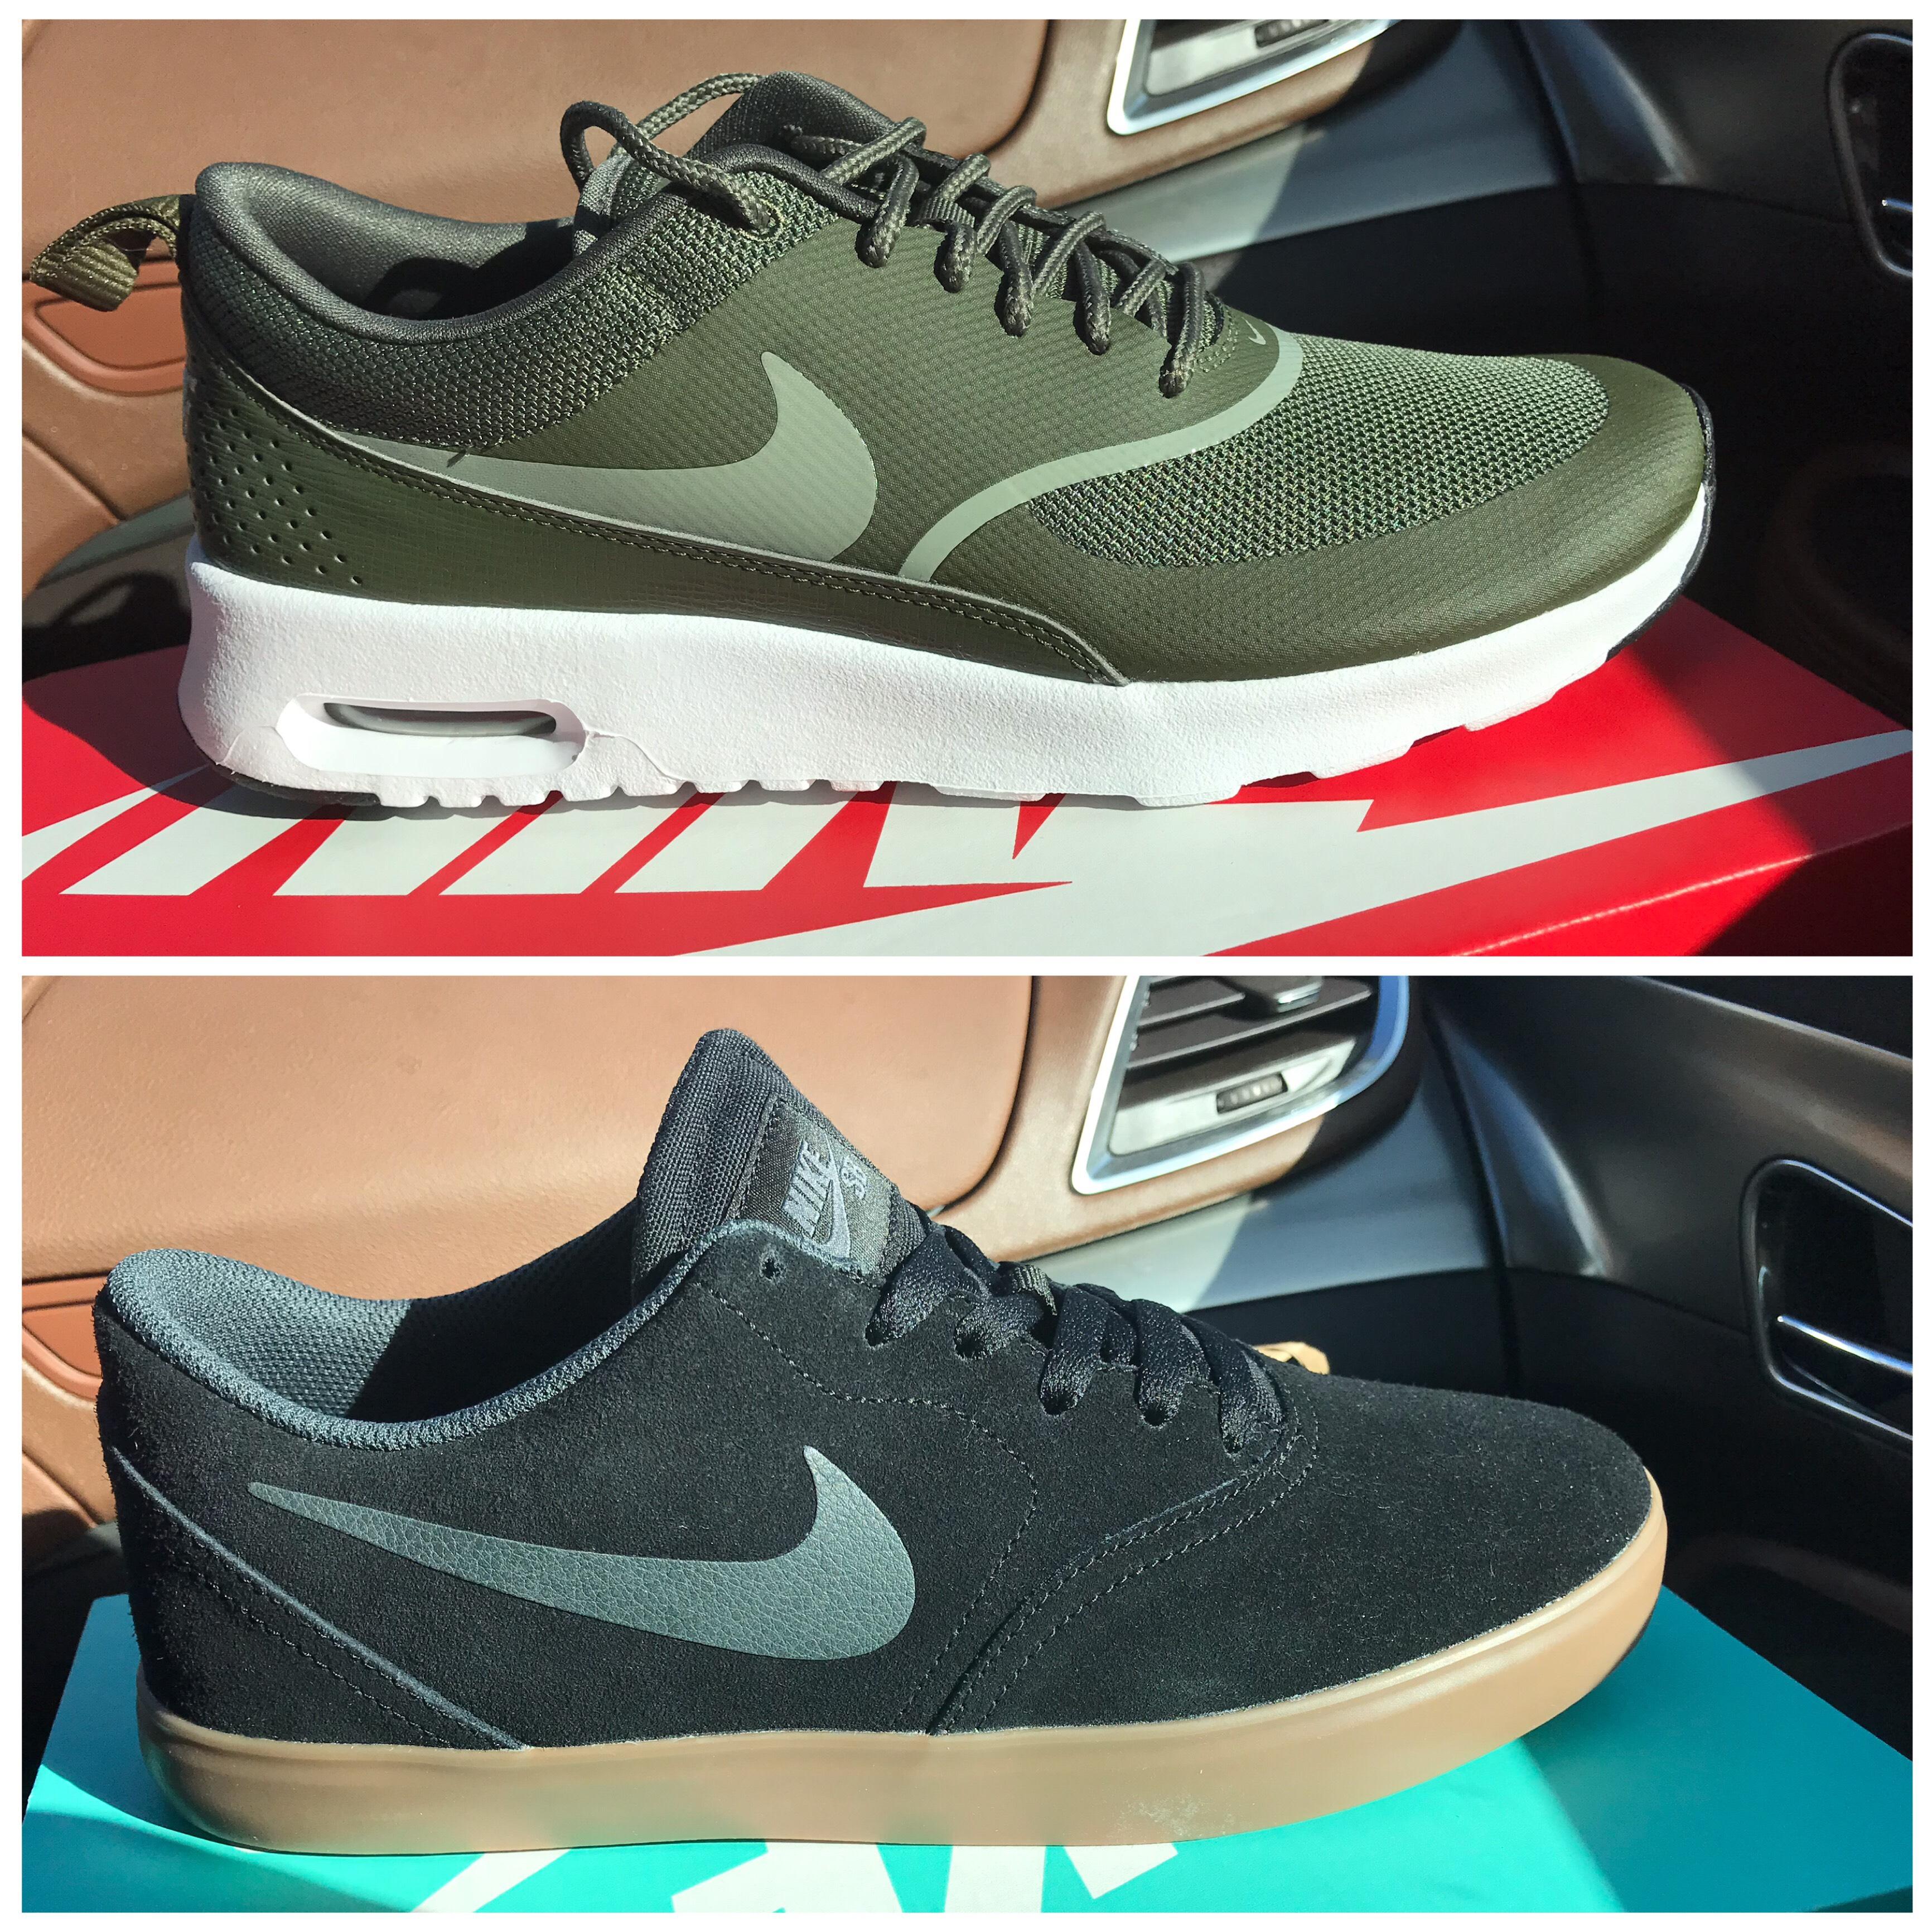 Nike Outlet Bataviastad 70% korting